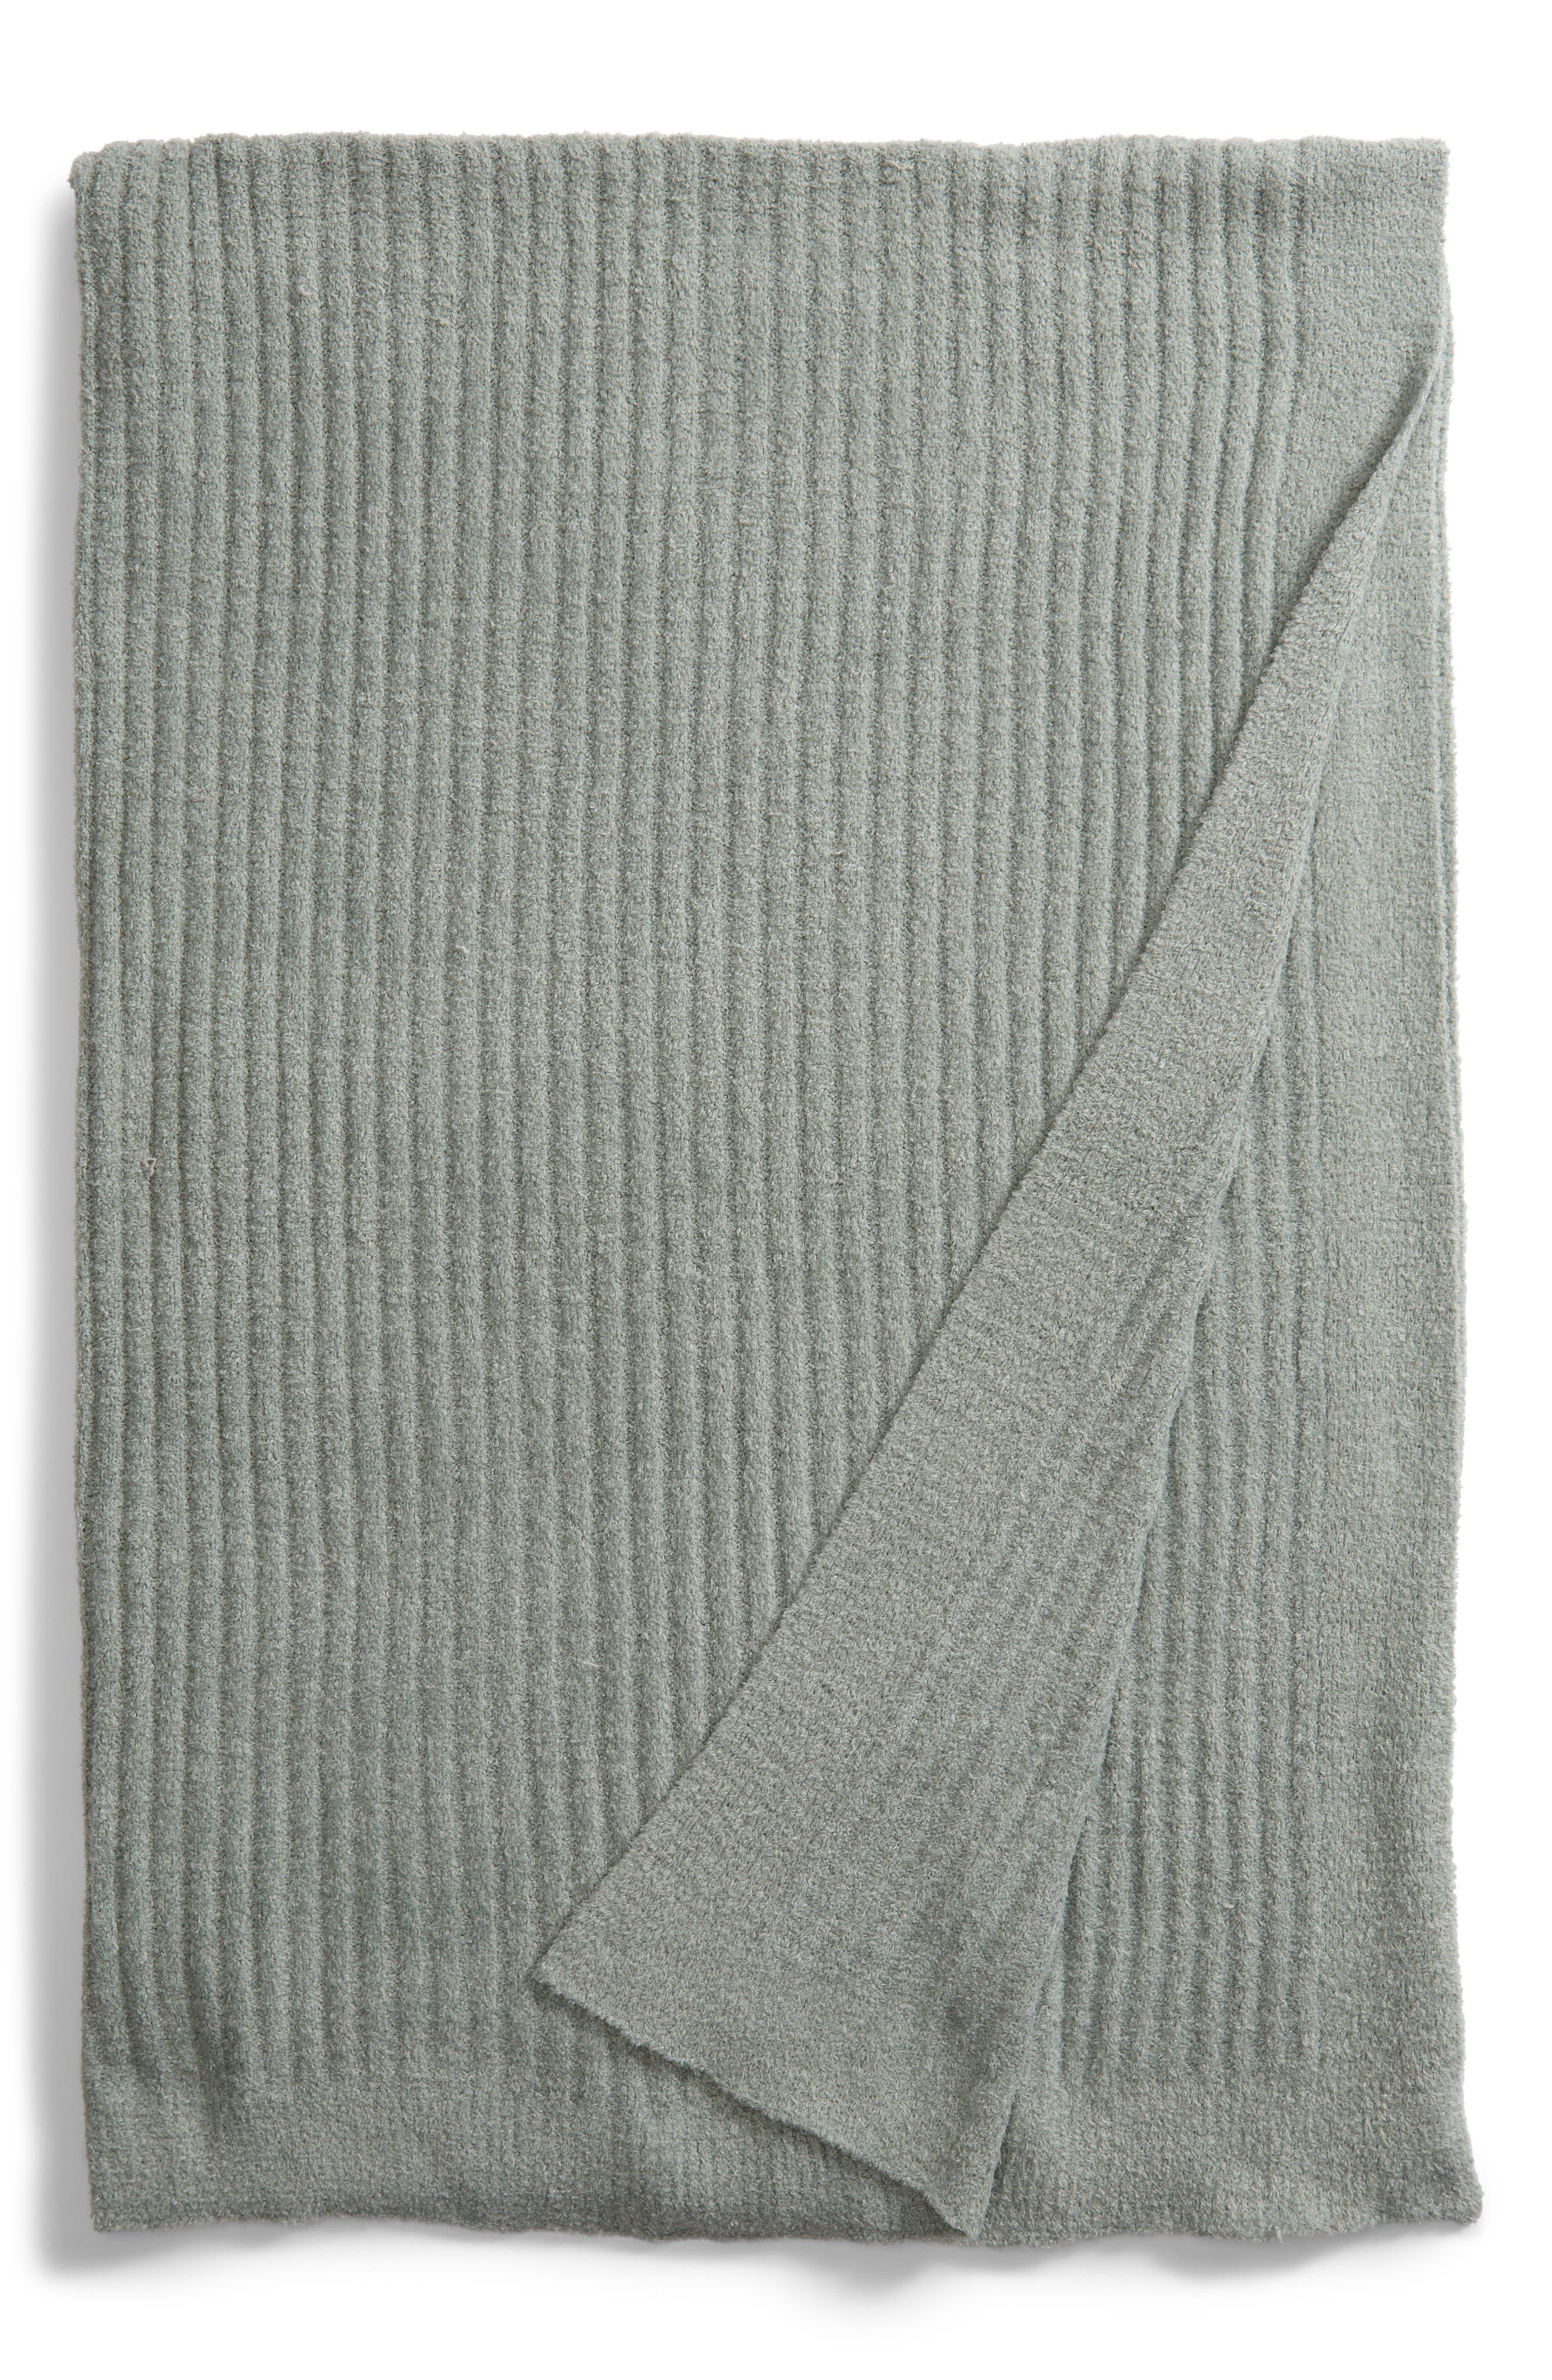 Cozychic<sup>®</sup> Ribbed Throw Blanket,                             Main thumbnail 1, color,                             ICEBERG GREEN